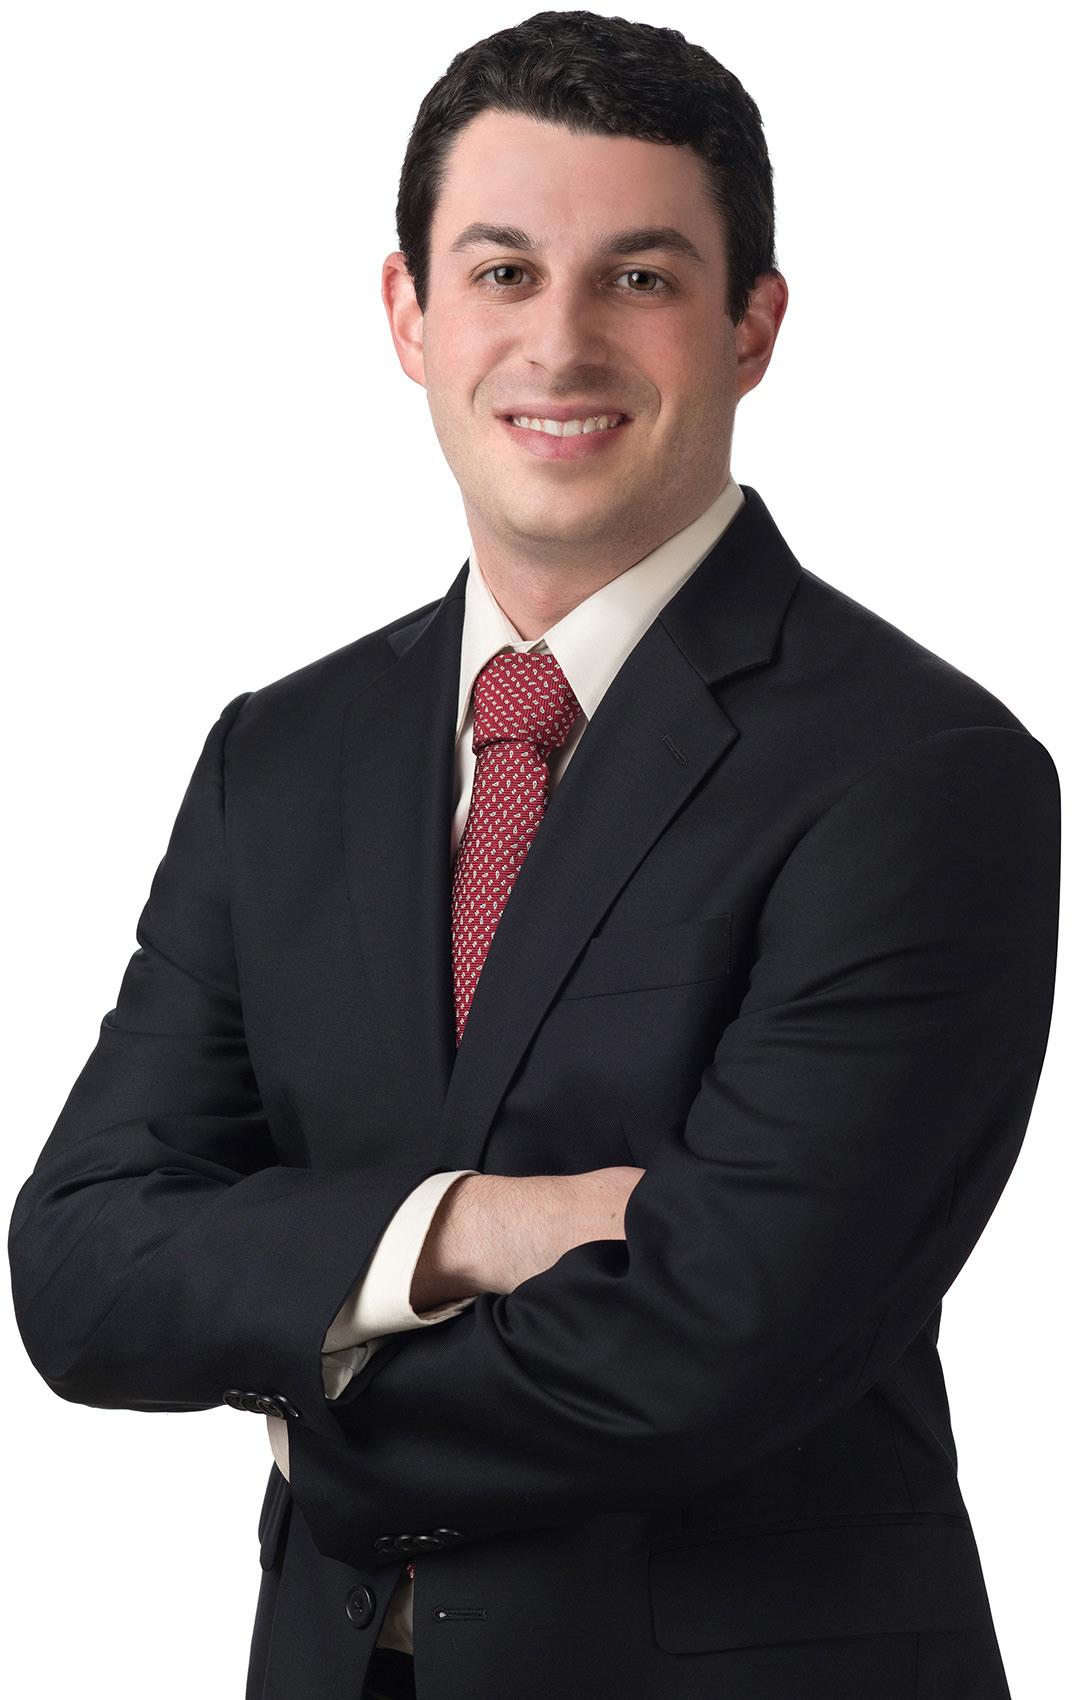 Seth M. Bloomfield